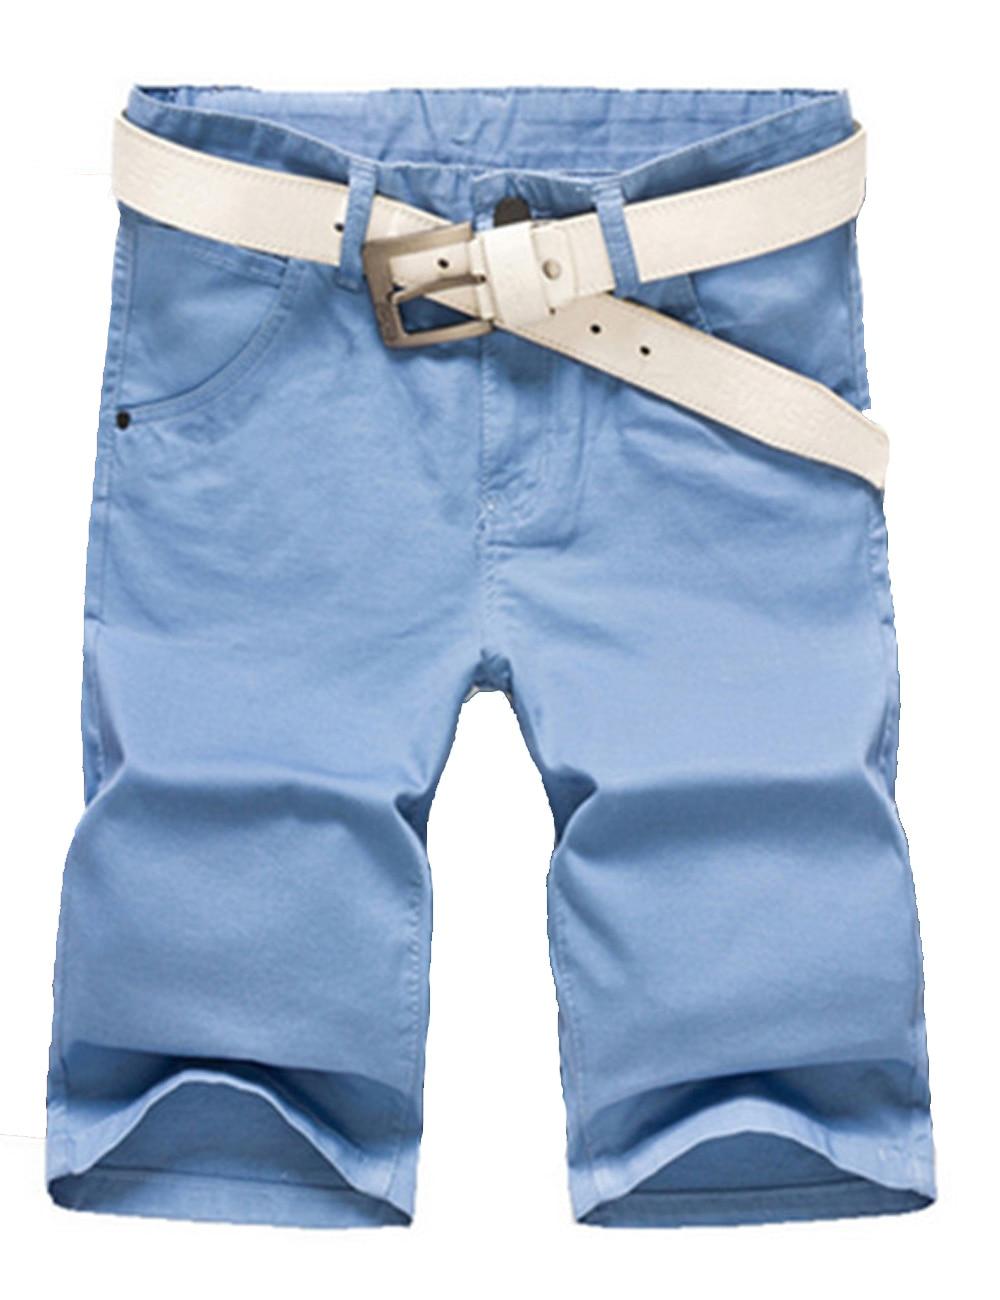 Online Get Cheap Cheap Bermuda Shorts -Aliexpress.com | Alibaba Group